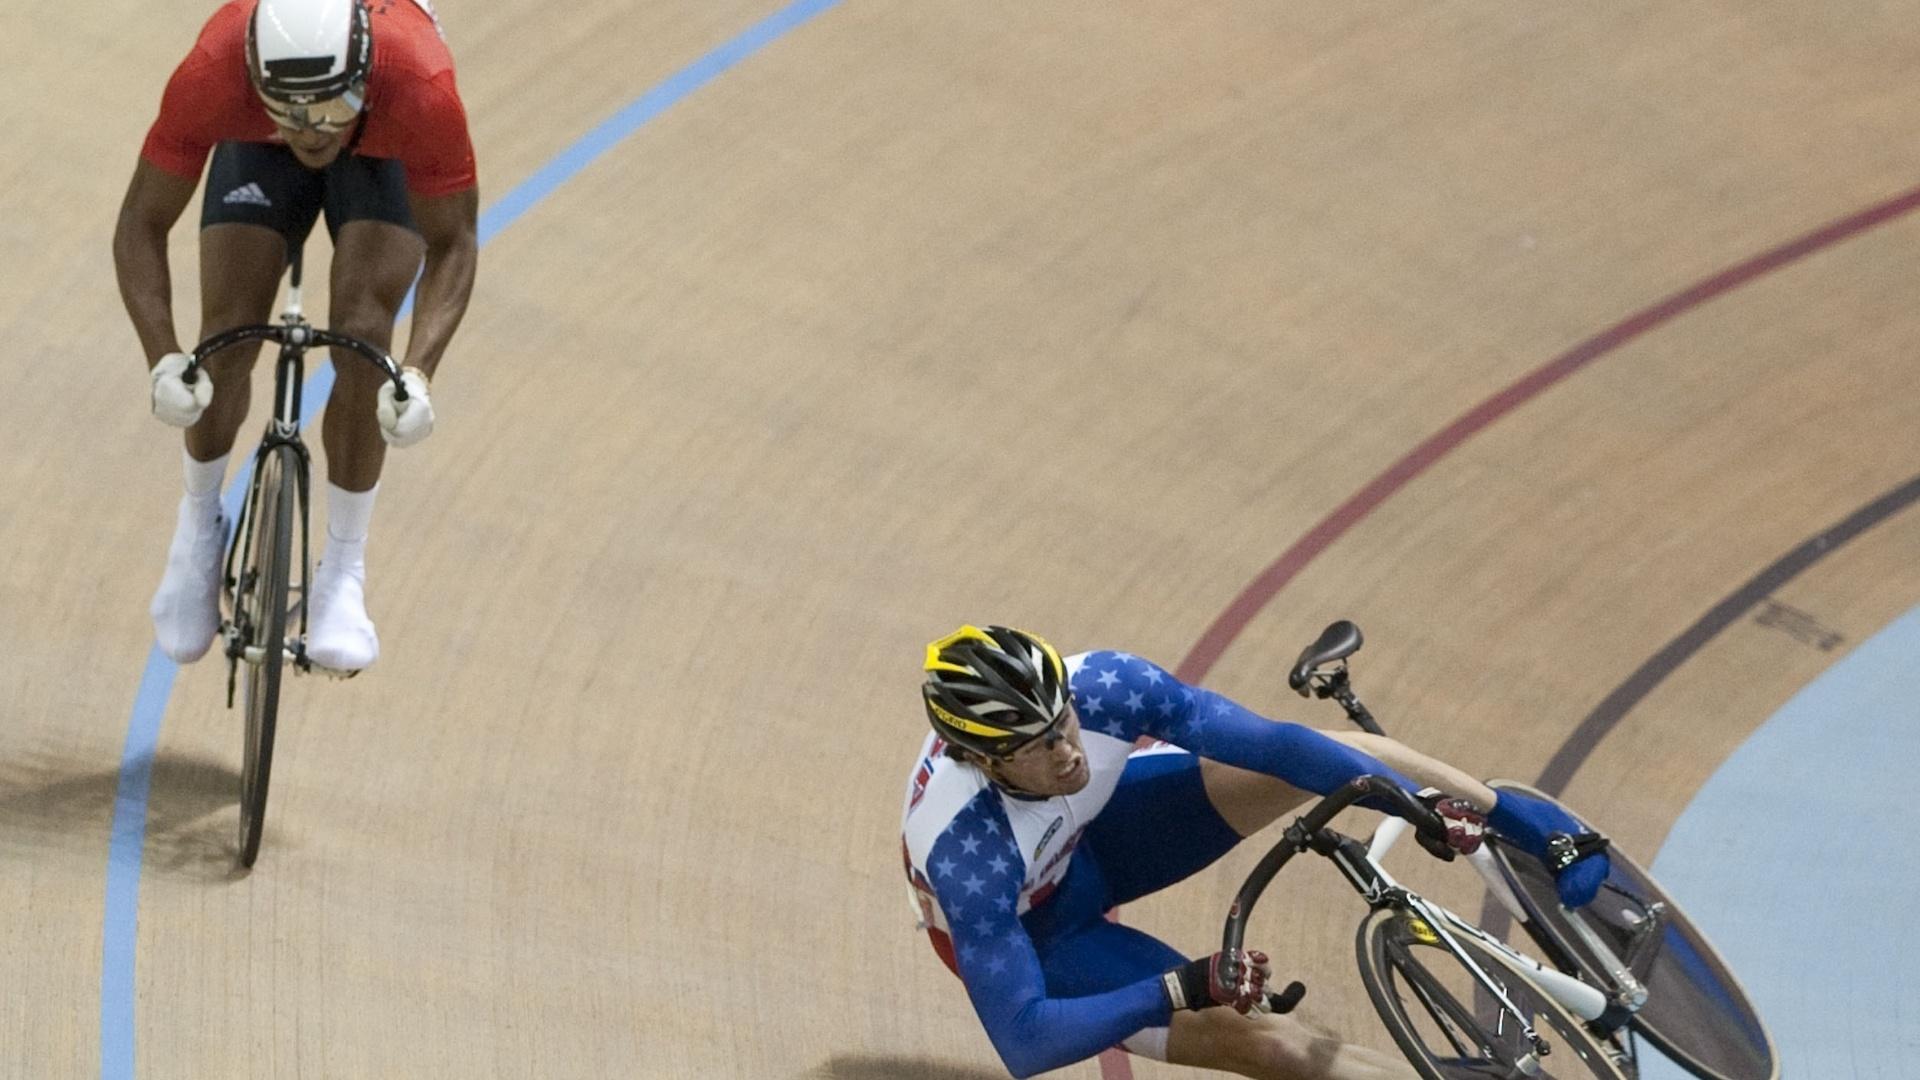 O americano Michael Blatchford leva um baita tombo durante a prova contra o ciclista de Trinidad e Tobago no Pan de Guadalajara